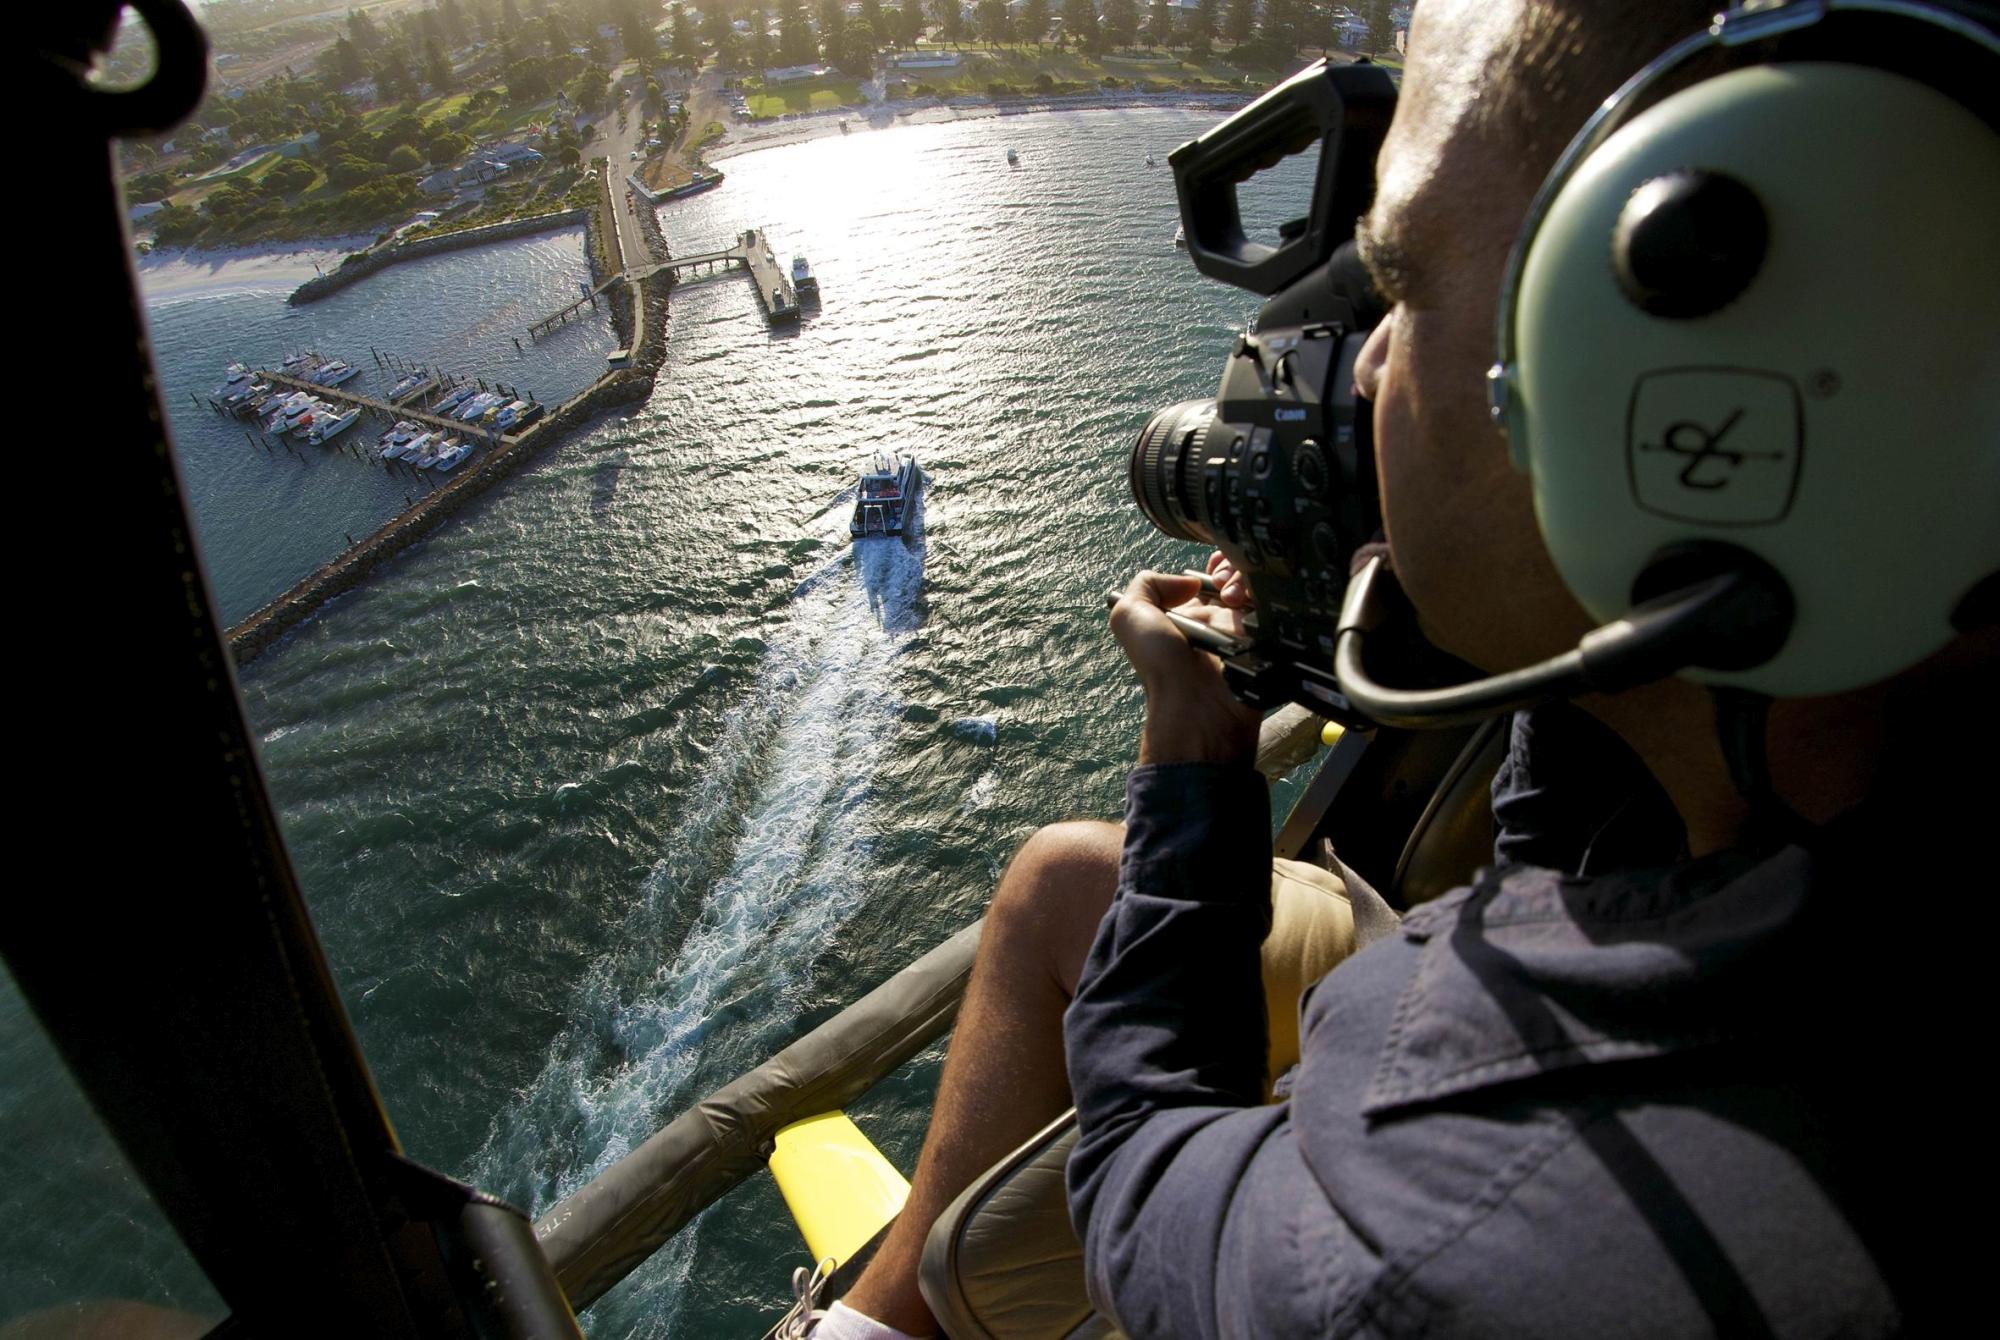 Leighton De Barros filming the expedition vessel arriving back in port in Esperance.